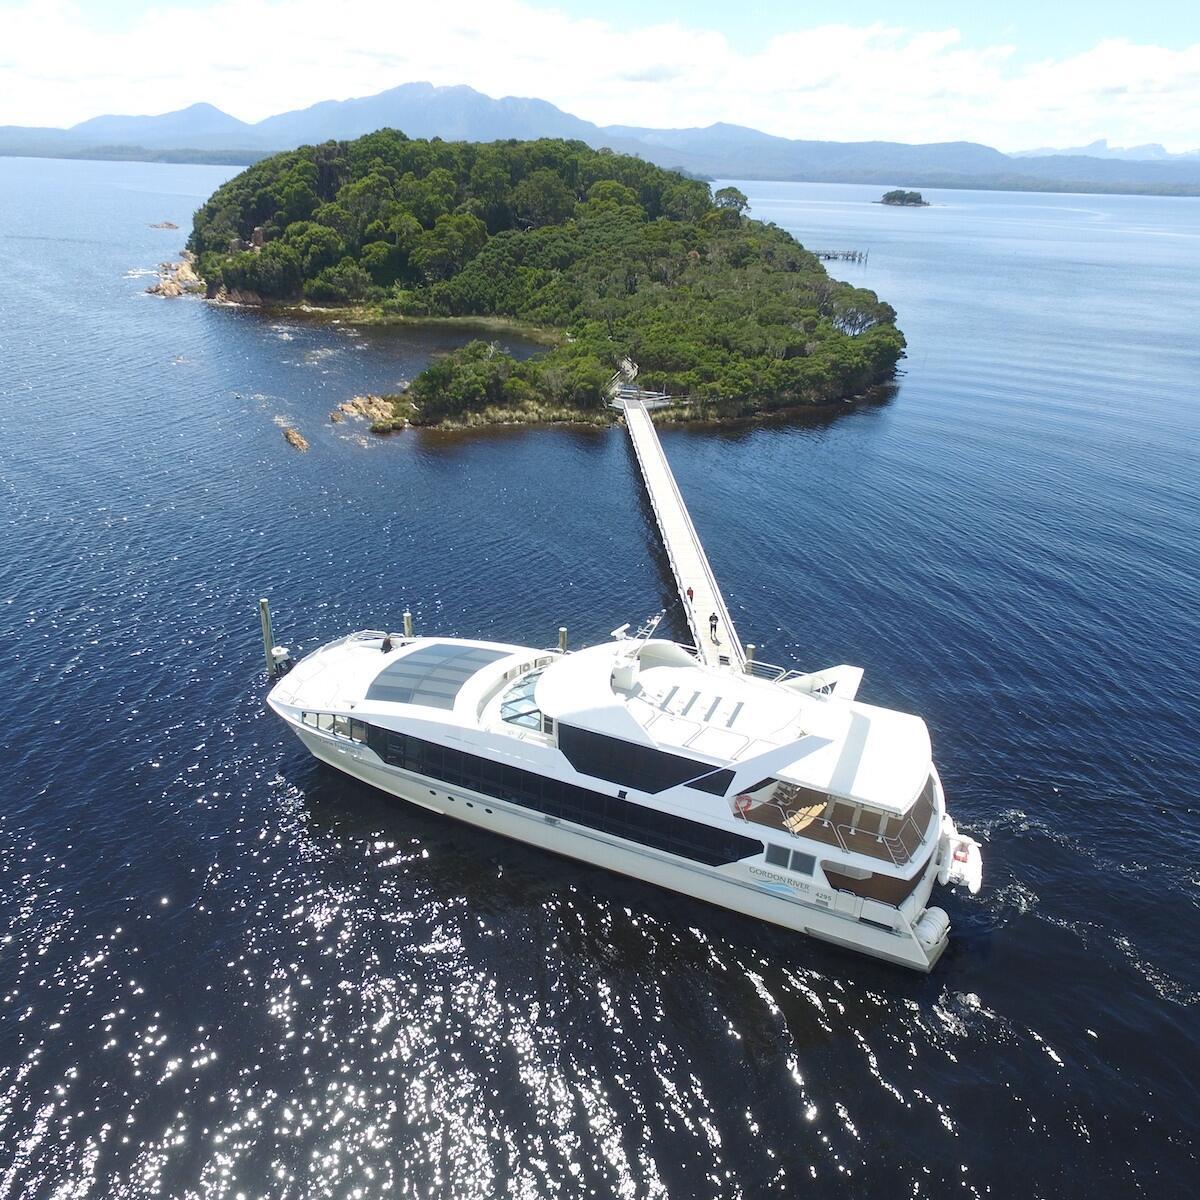 Sarah Island with the vessel ship near Gordon River Cruises